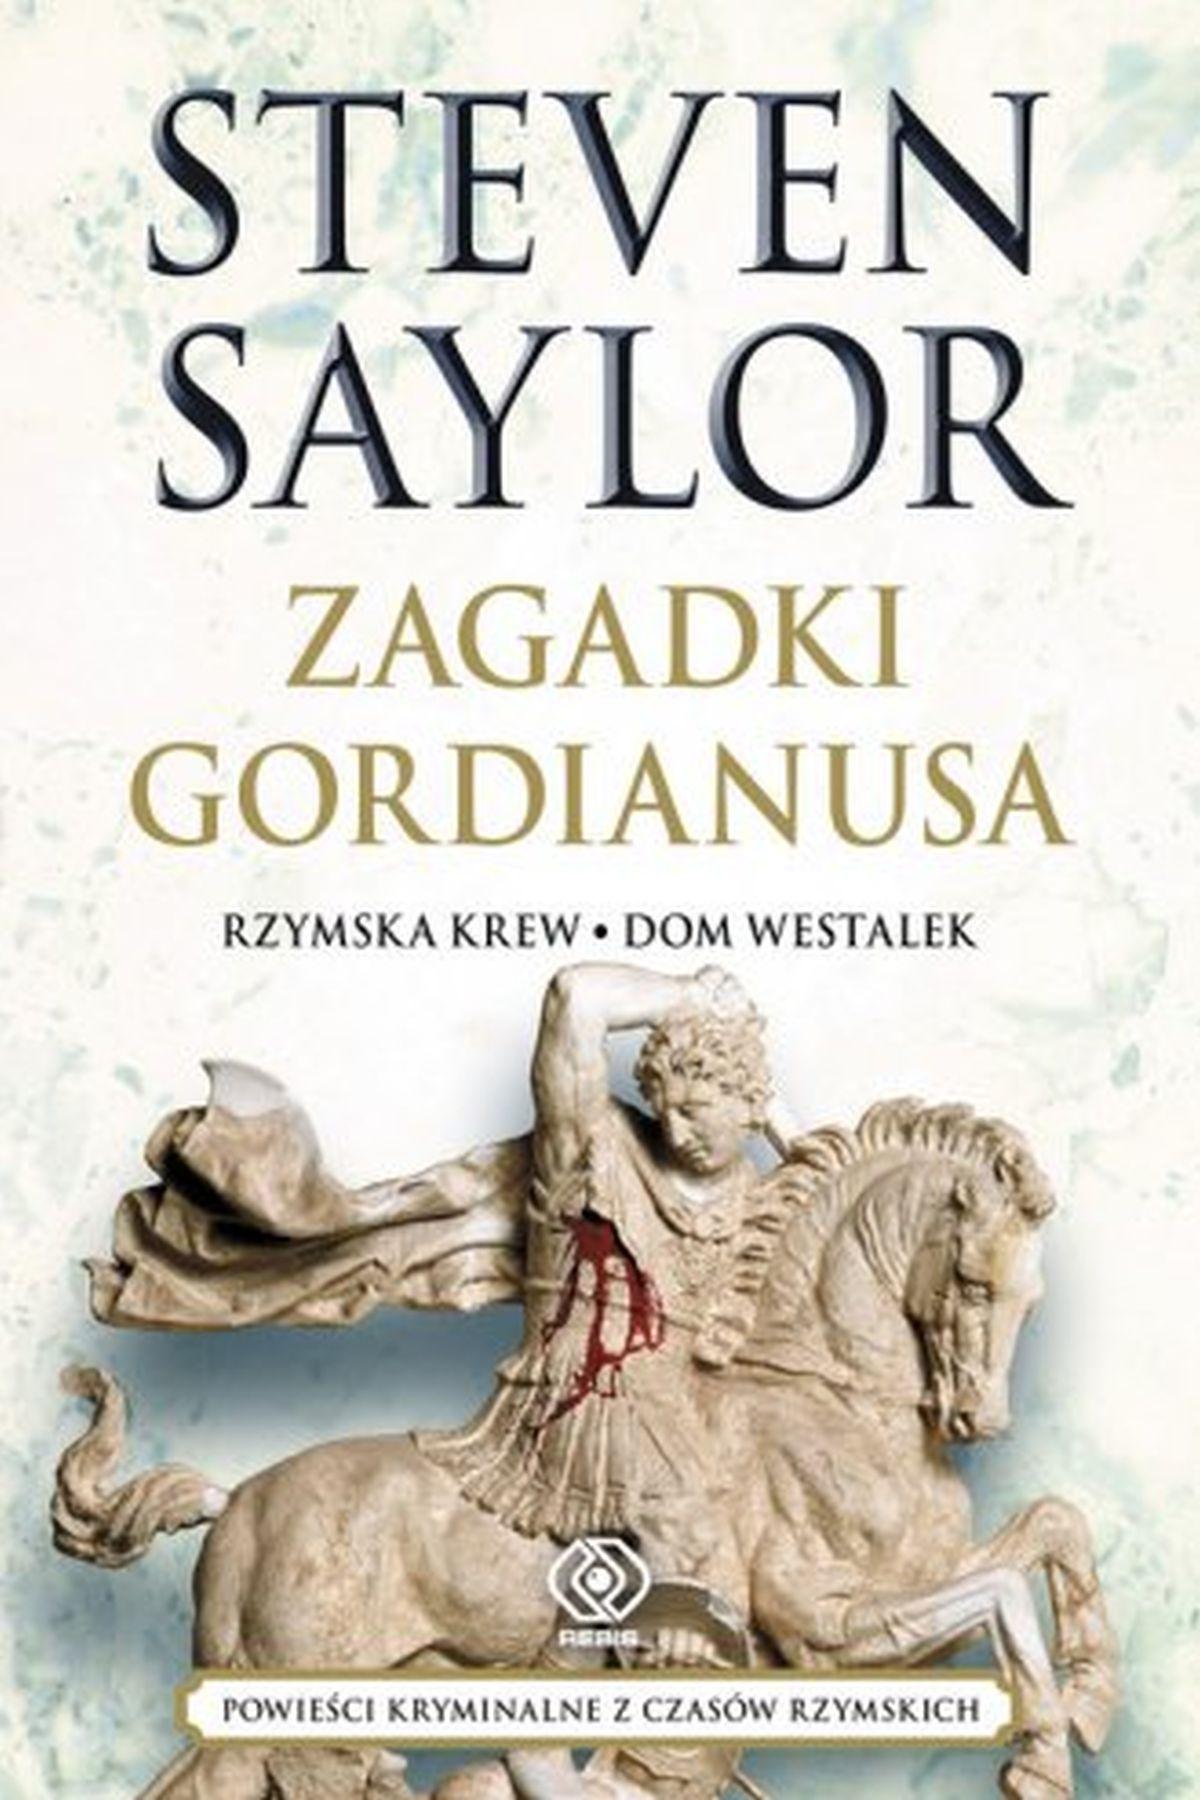 Zagadki Gordianusa